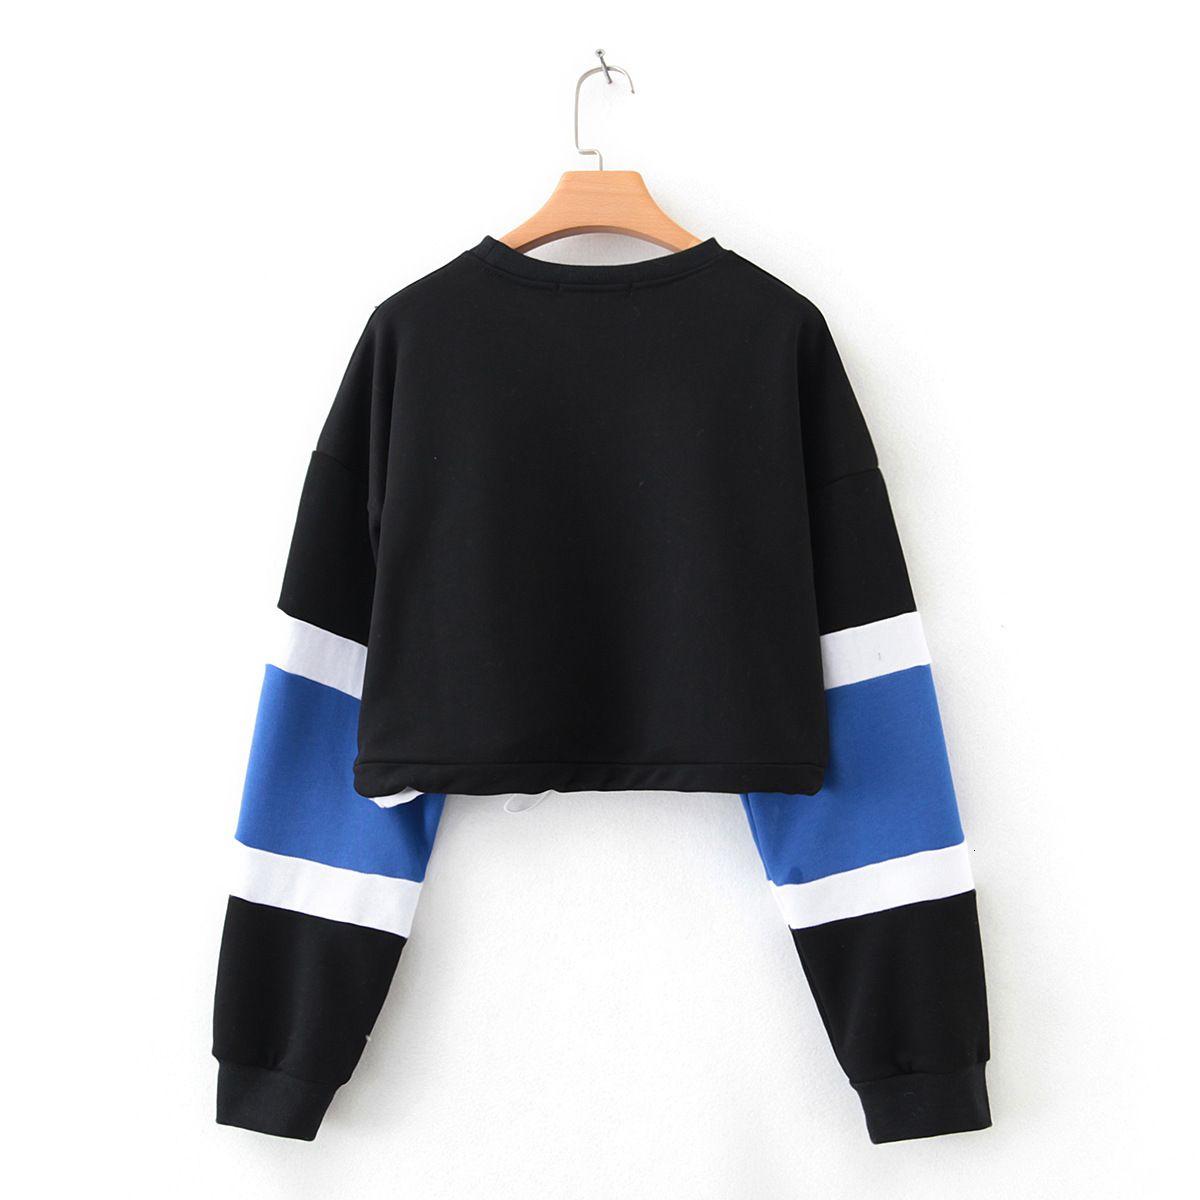 Sweat à capuche à capuche à manches longues Mode Femme Swewoprise Femme Sweatshirt Pull Tops Short Blouse Streetwear Sudadera Mujer